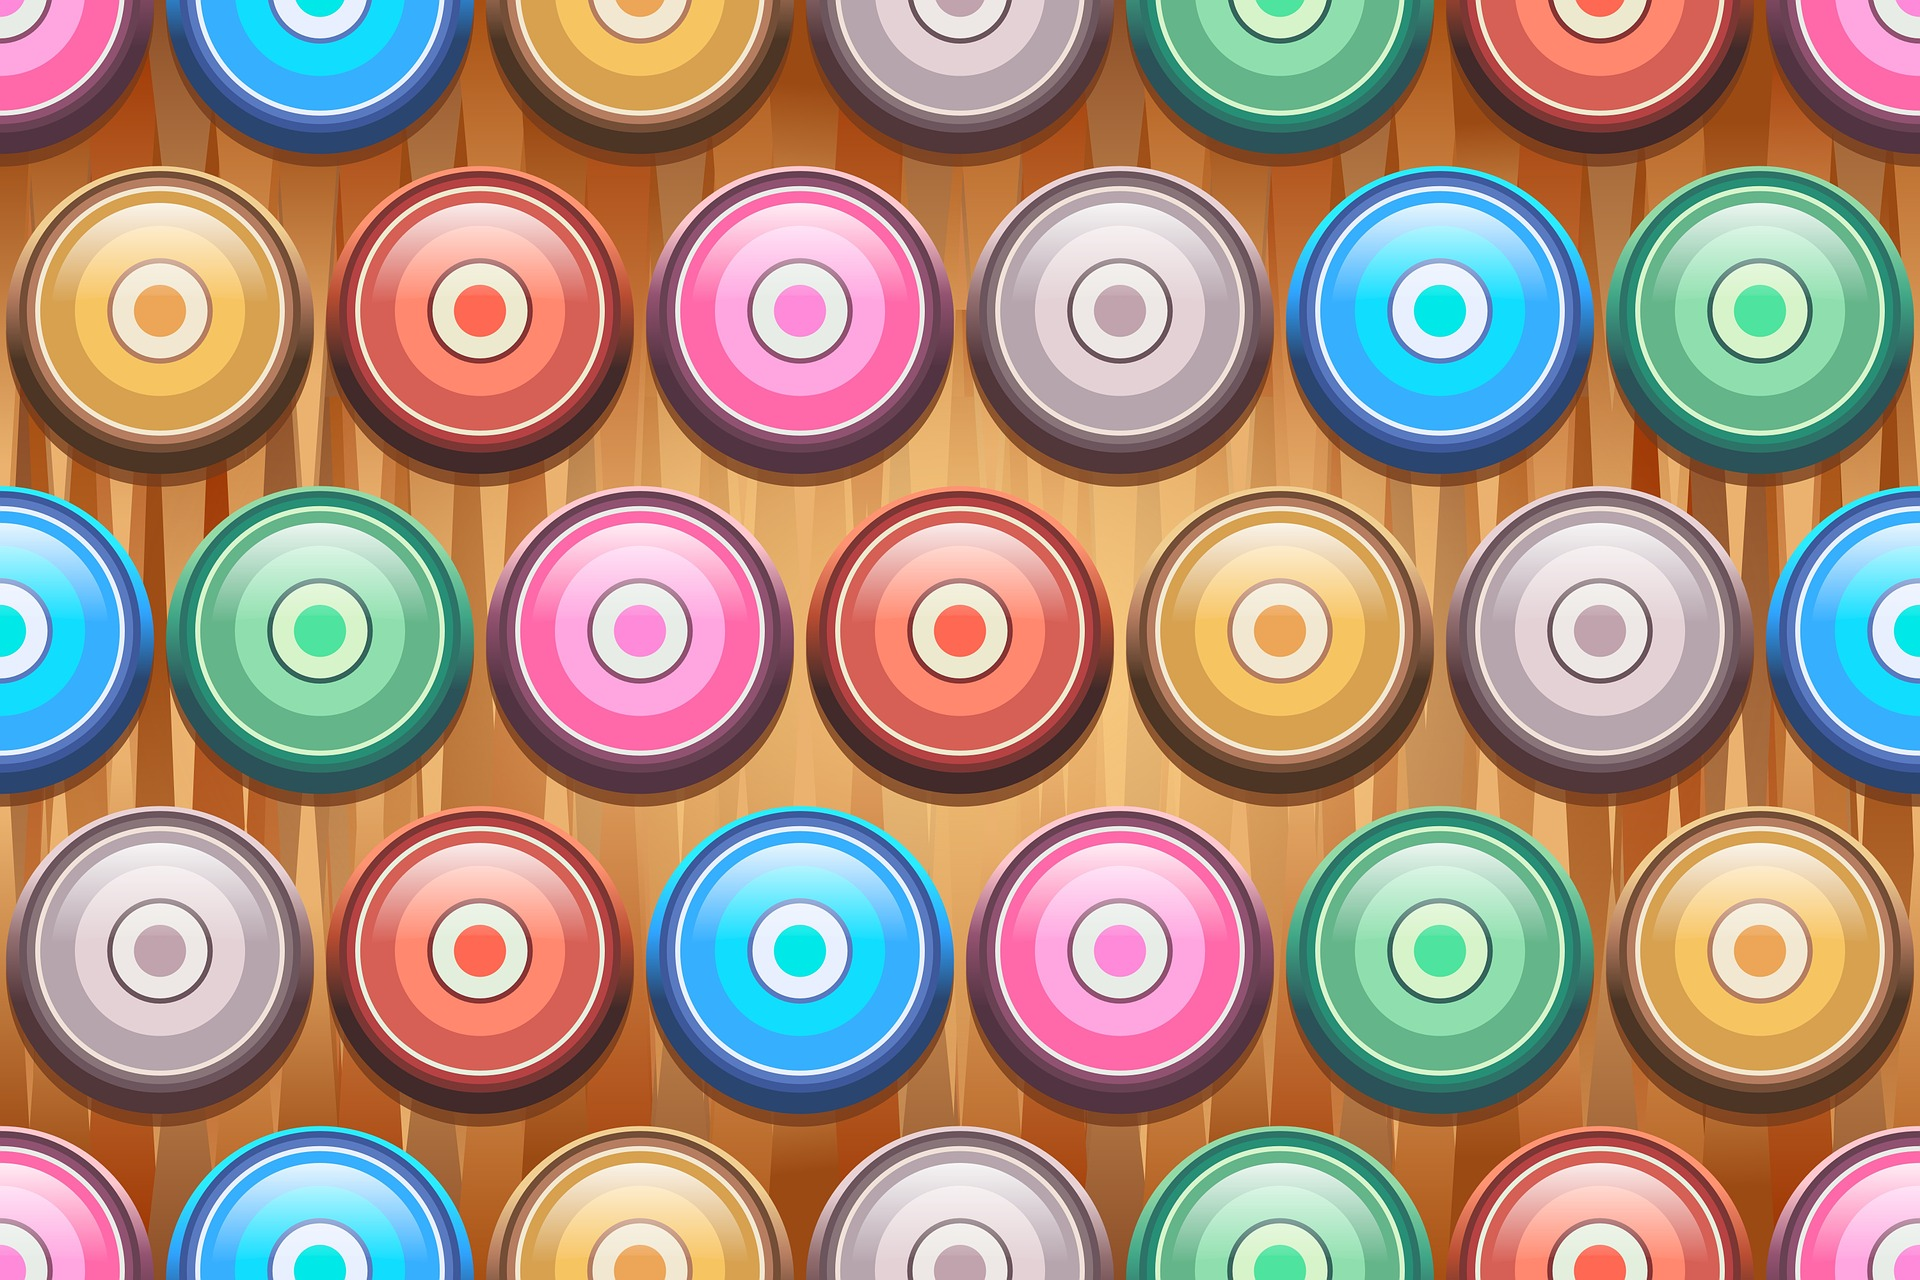 диски, круги, цвета, концентрические, Симметрия - Обои HD - Профессор falken.com